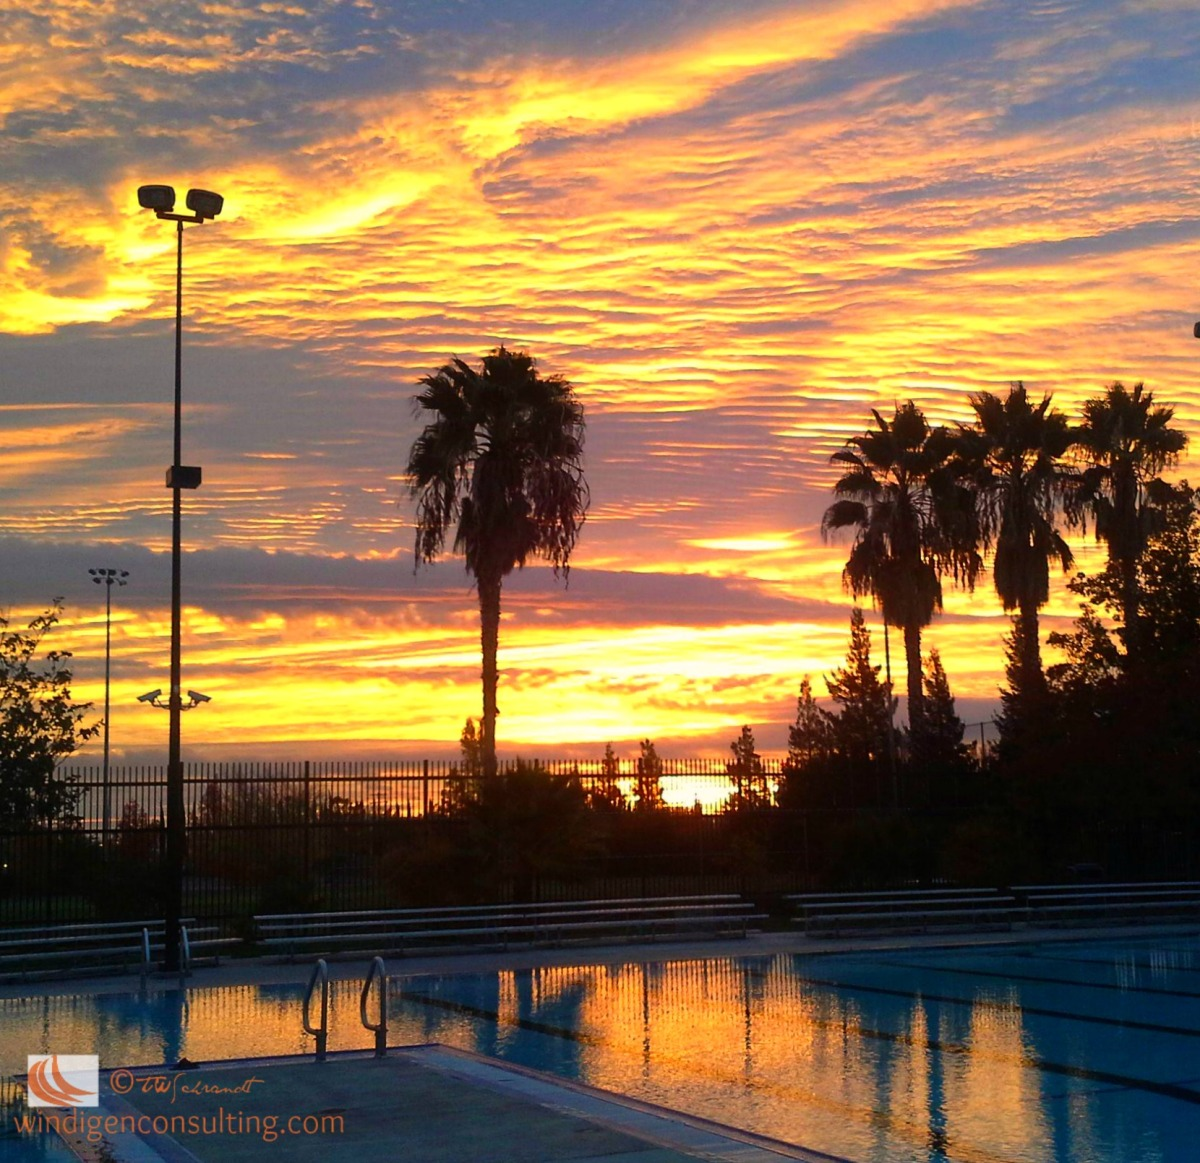 Winter Sunrise over swimming pool